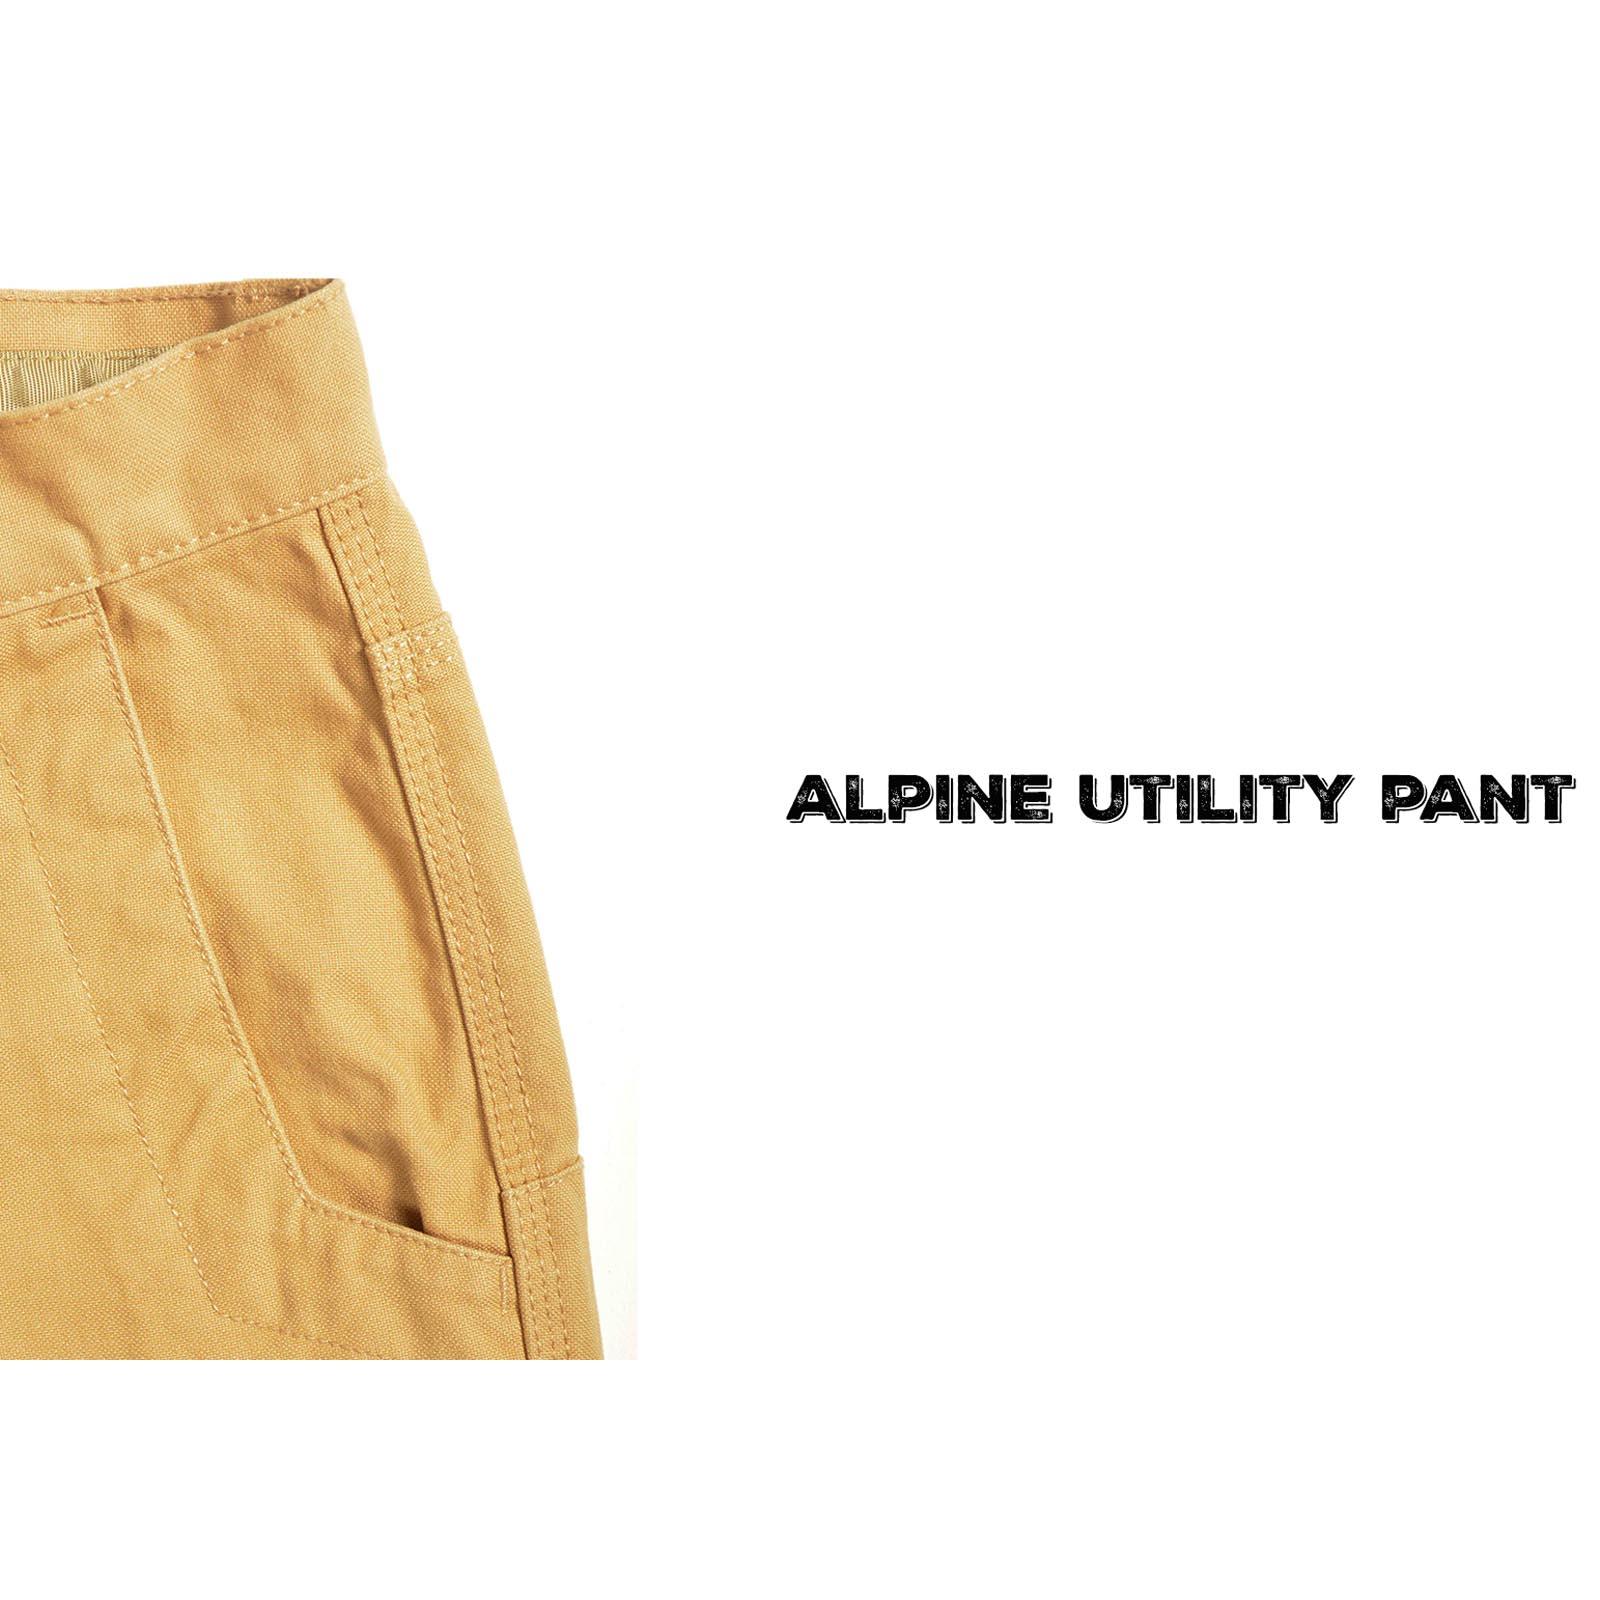 Alpine Utility Detail